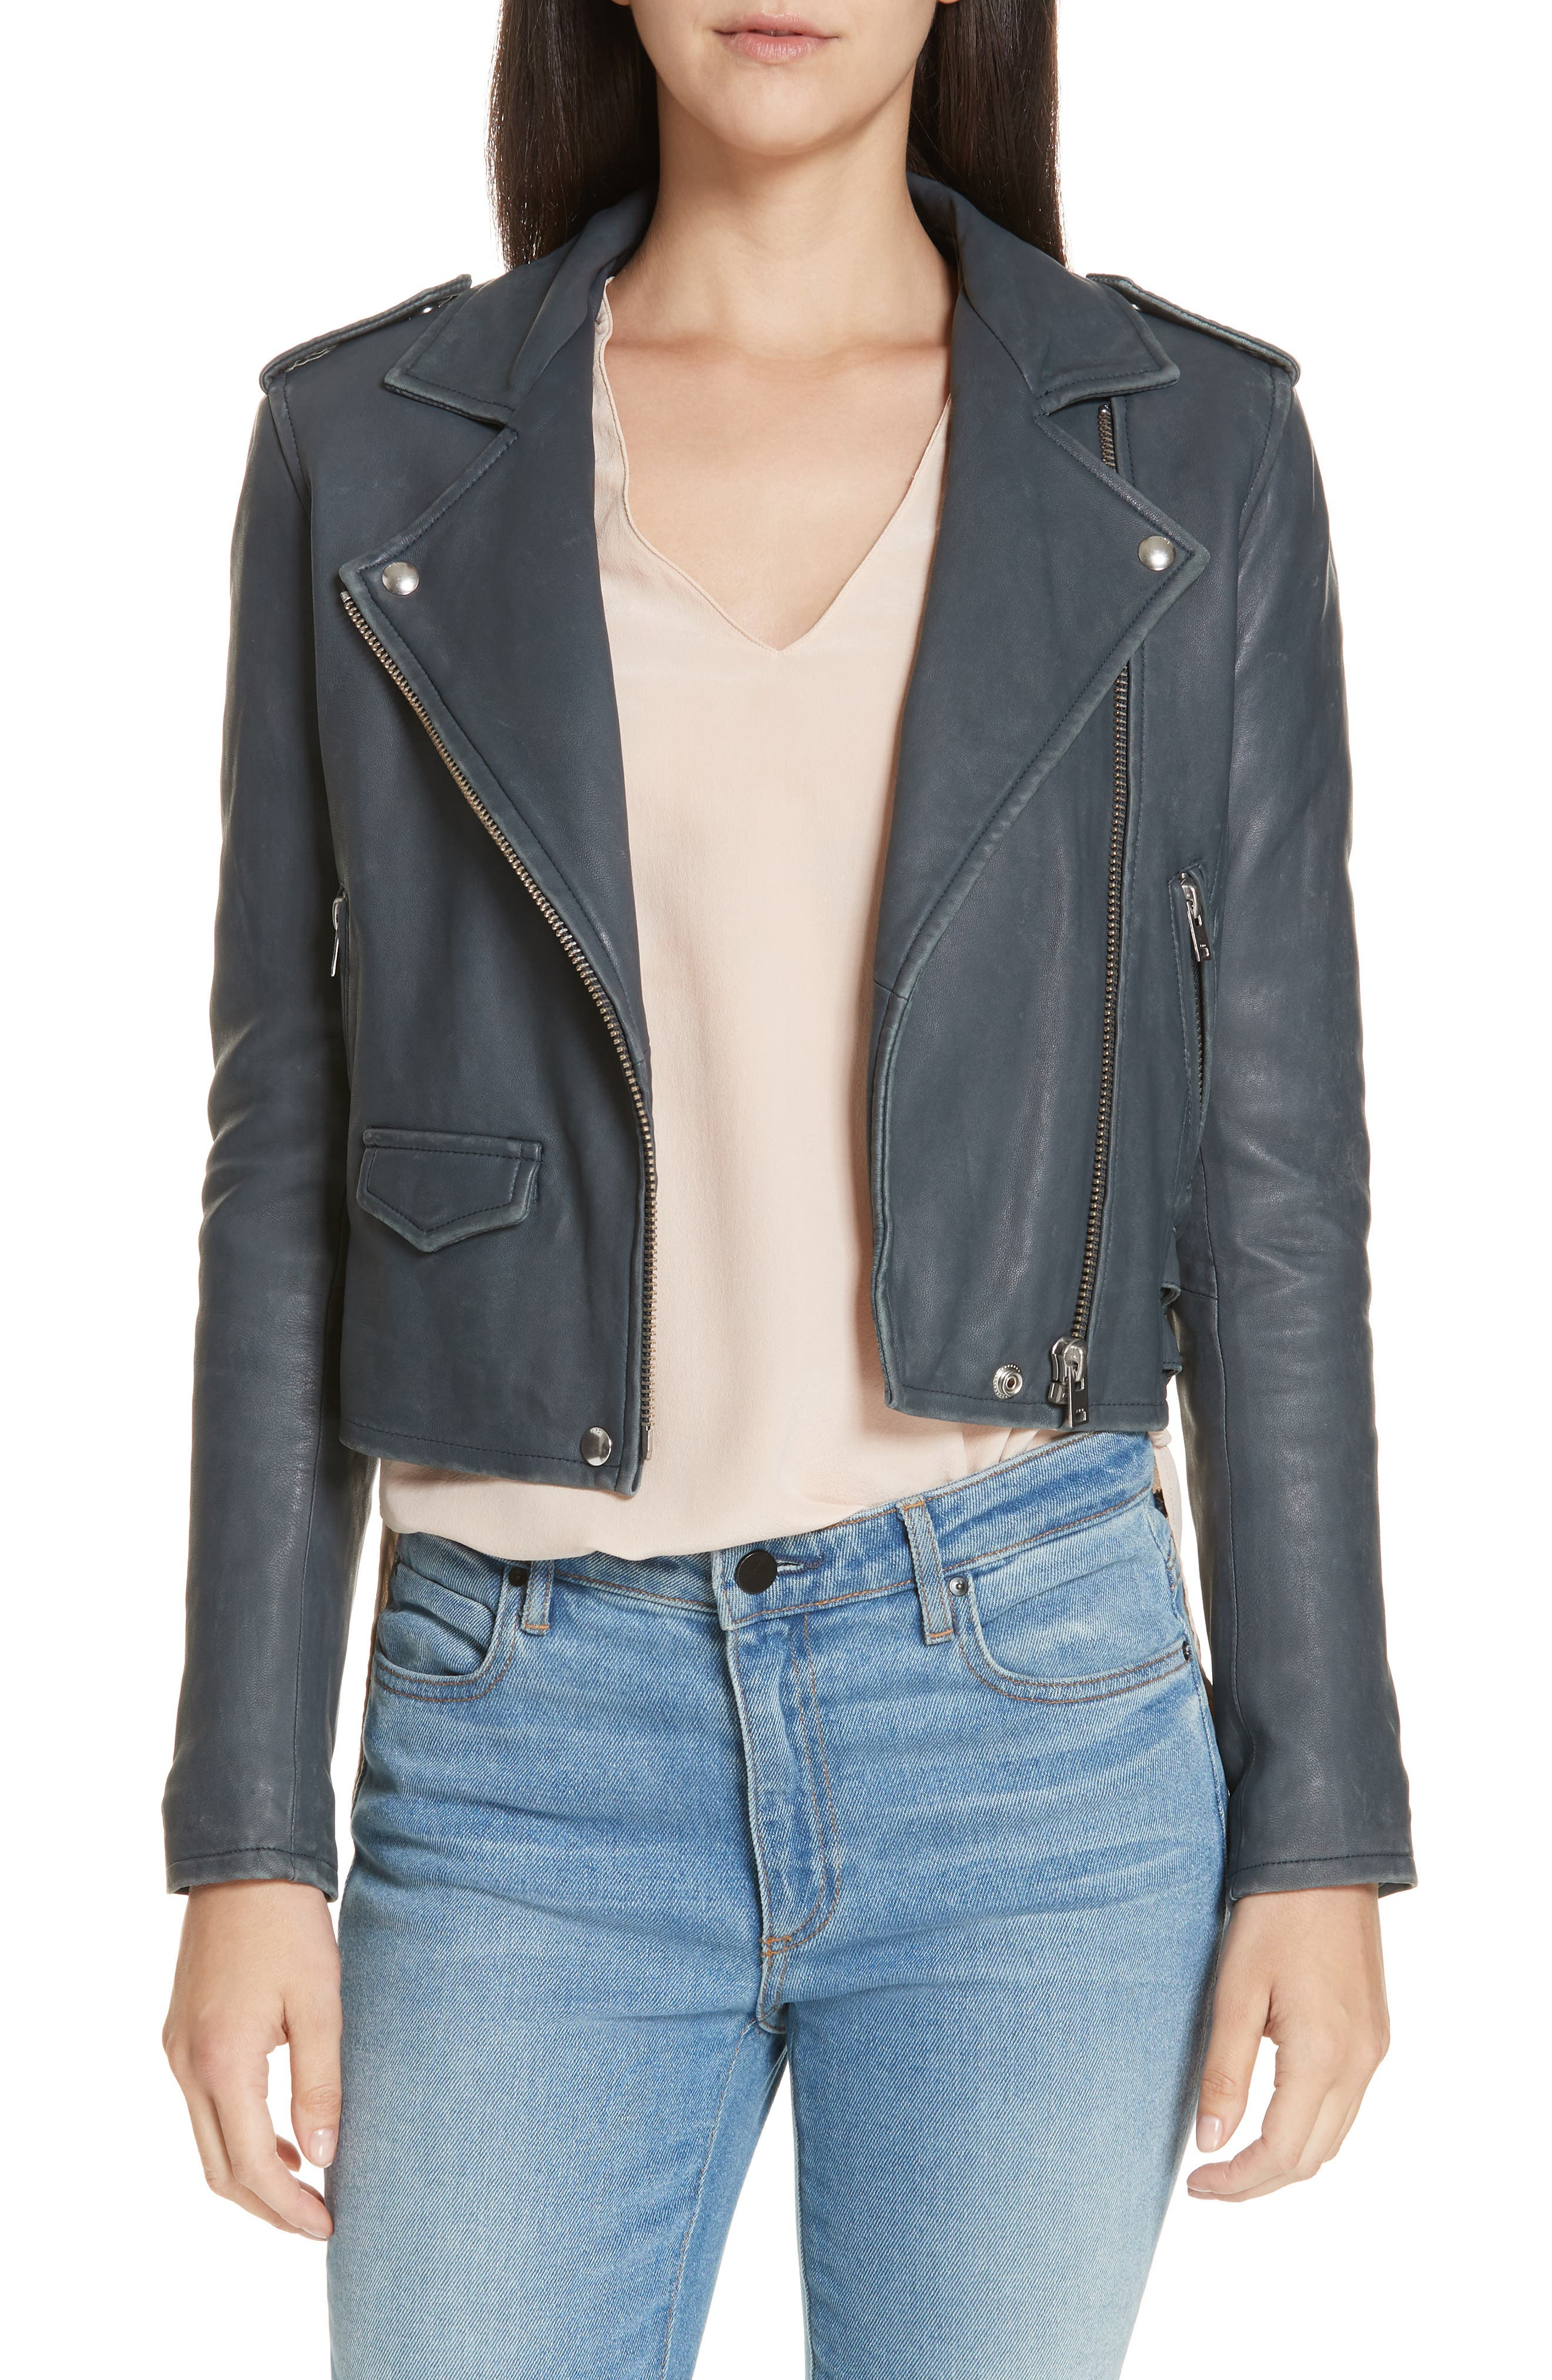 IRO, 'Ashville' Leather Jacket, Main thumbnail 1, color, GREY DENIM